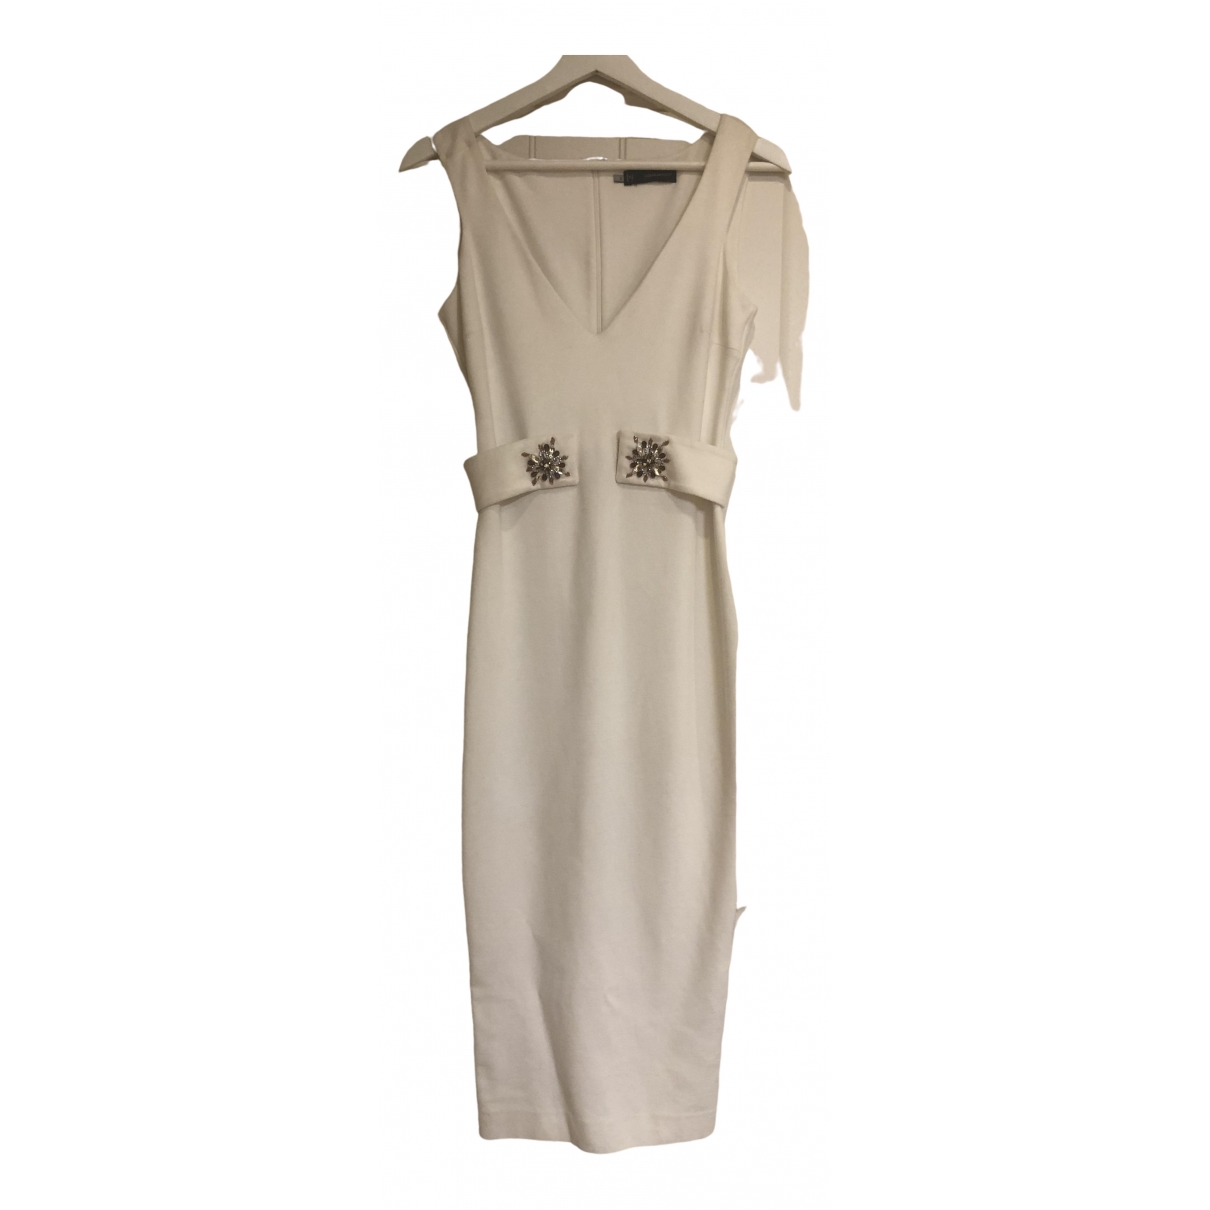 Dsquared2 \N Ecru Cotton dress for Women S International